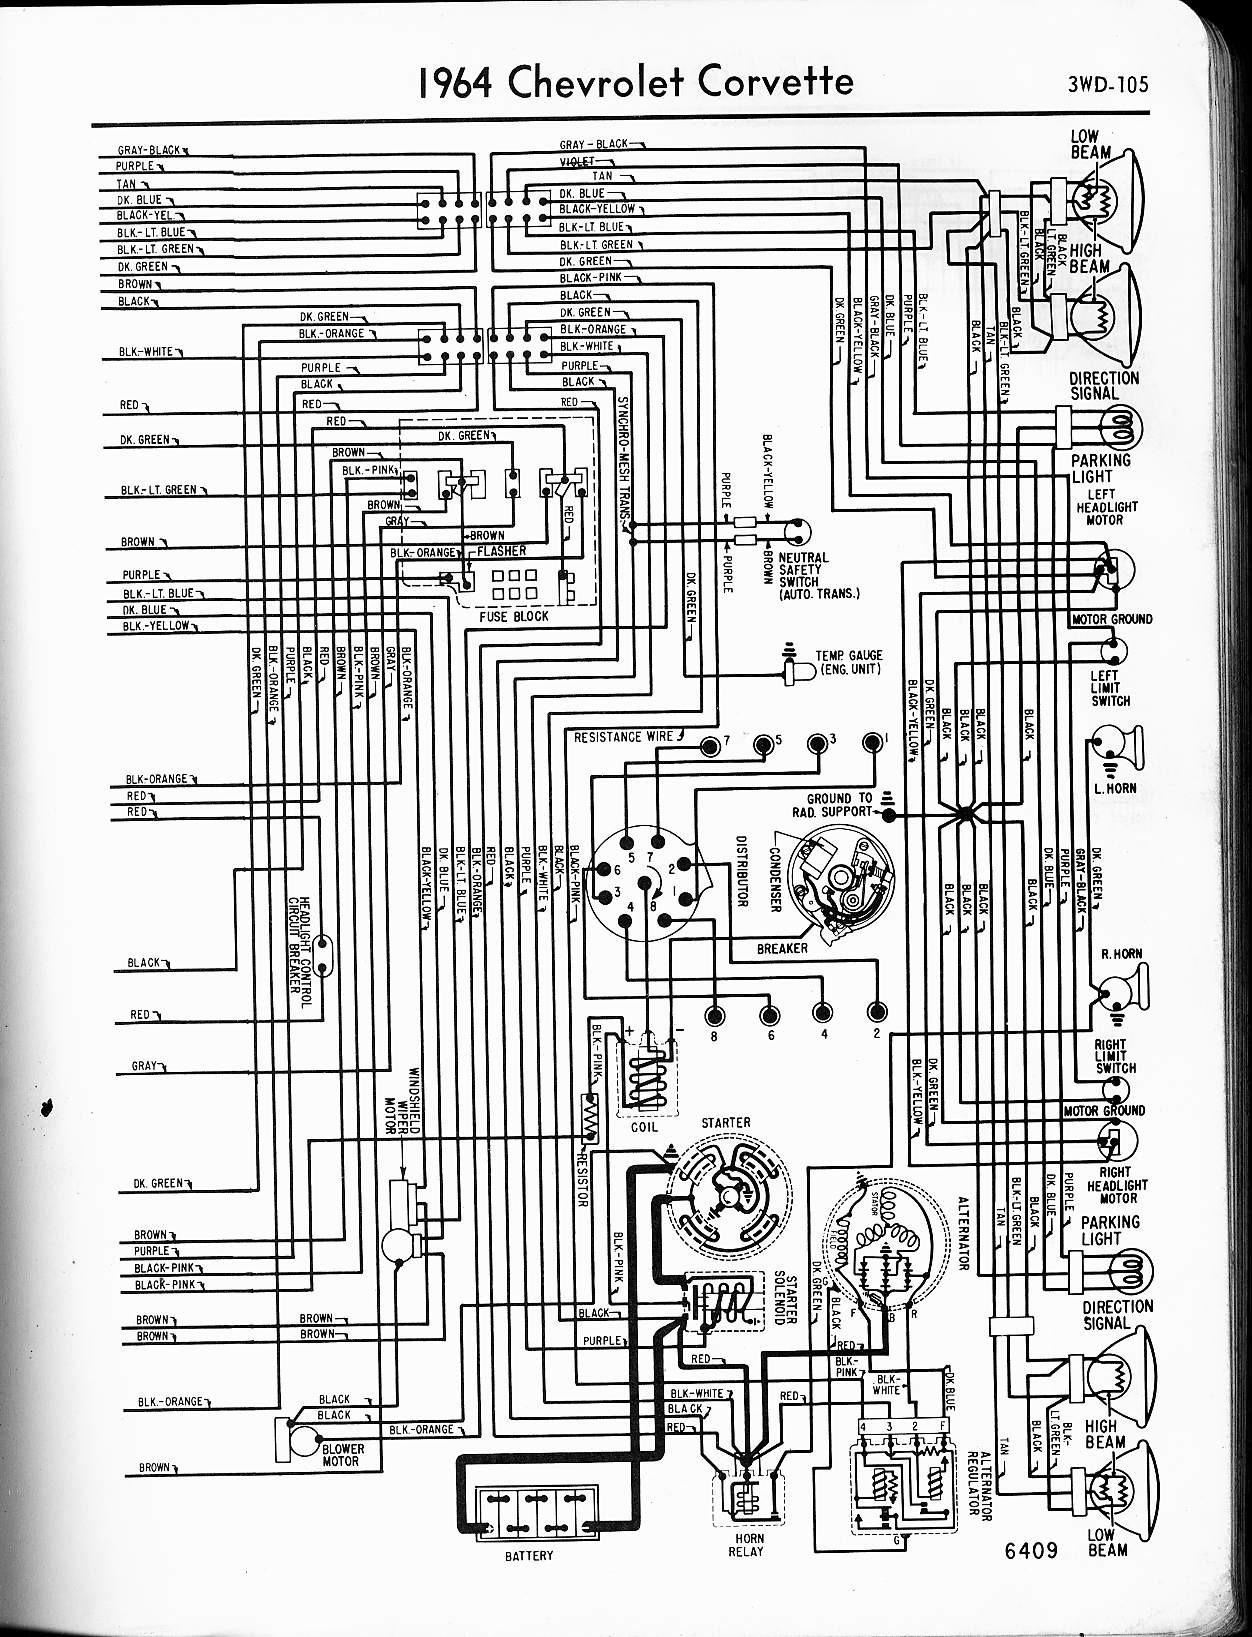 1966 Corvette Ac Wiring Library. 1966 Corvette Ac Wiring Auto Electrical Diagram Rh Radtour Co 1957 Starter. Corvette. 67 Corvette Air Conditioning Diagram At Scoala.co